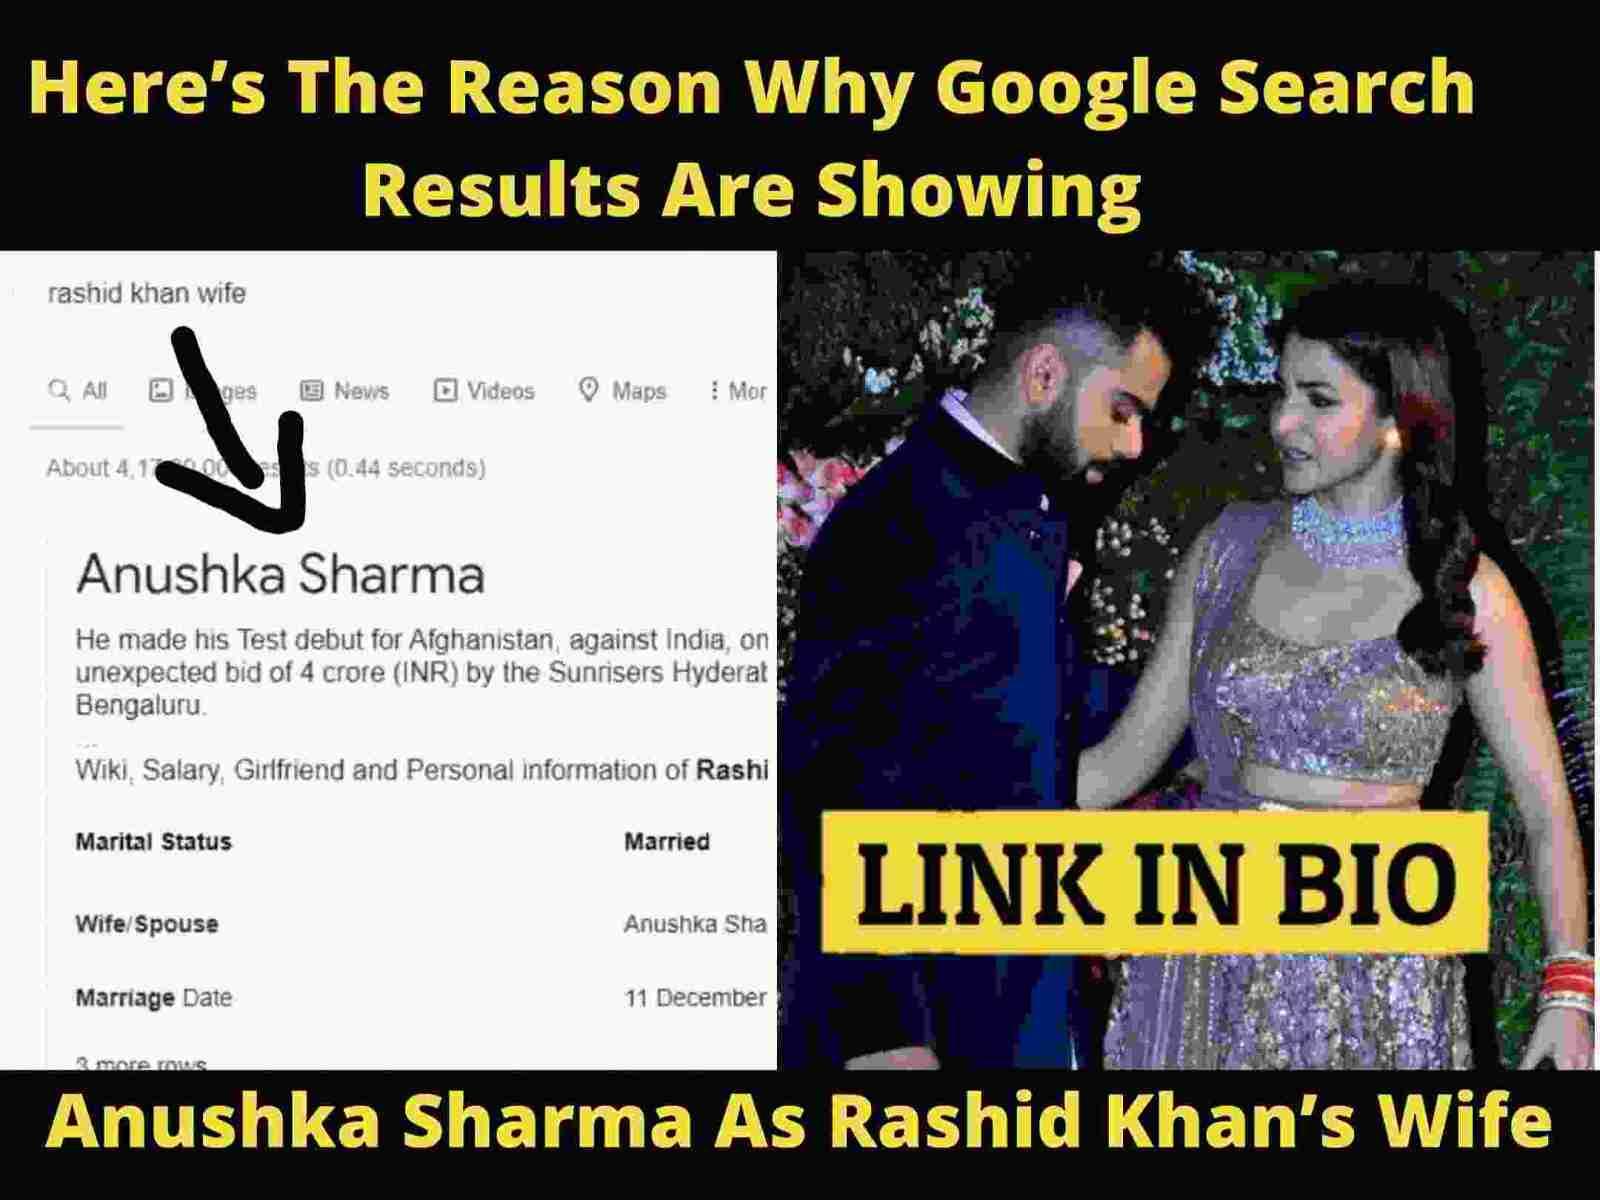 Rashid khan wife is anushka sharma